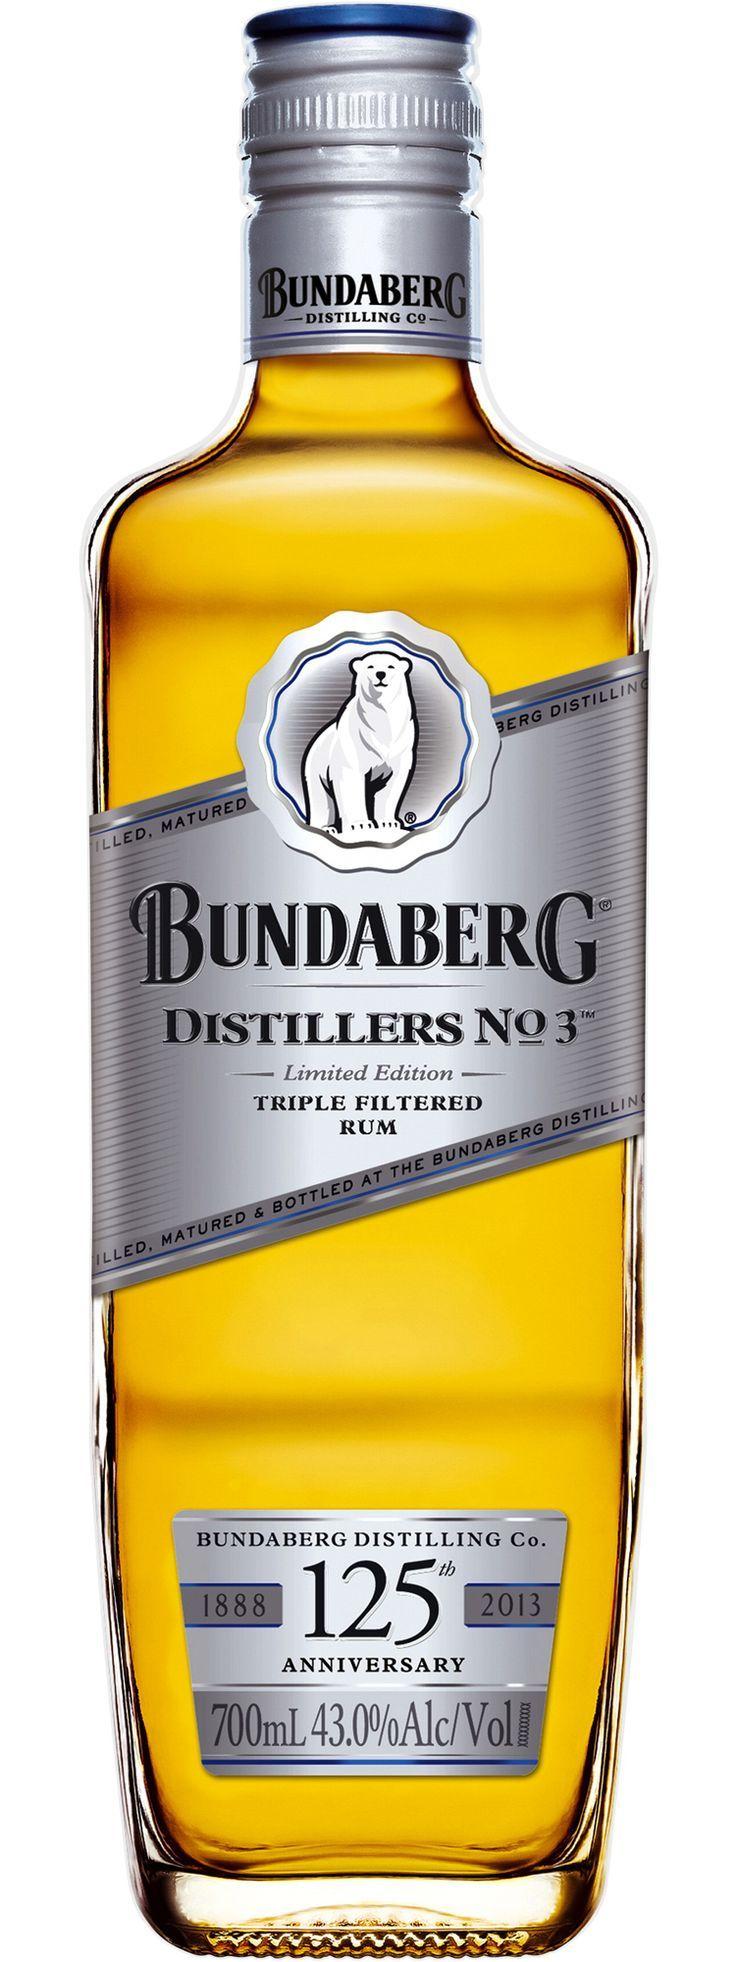 MUST GET THIS, CANT WAIT! •Bundaberg Rum Distilling co. #the #best #rum #world #wide #queensland #Australia #yum #drink #alcohol #polar #bear #rum #bundy #yeast #sugar #cane #distil #water #good #afternoon #drink